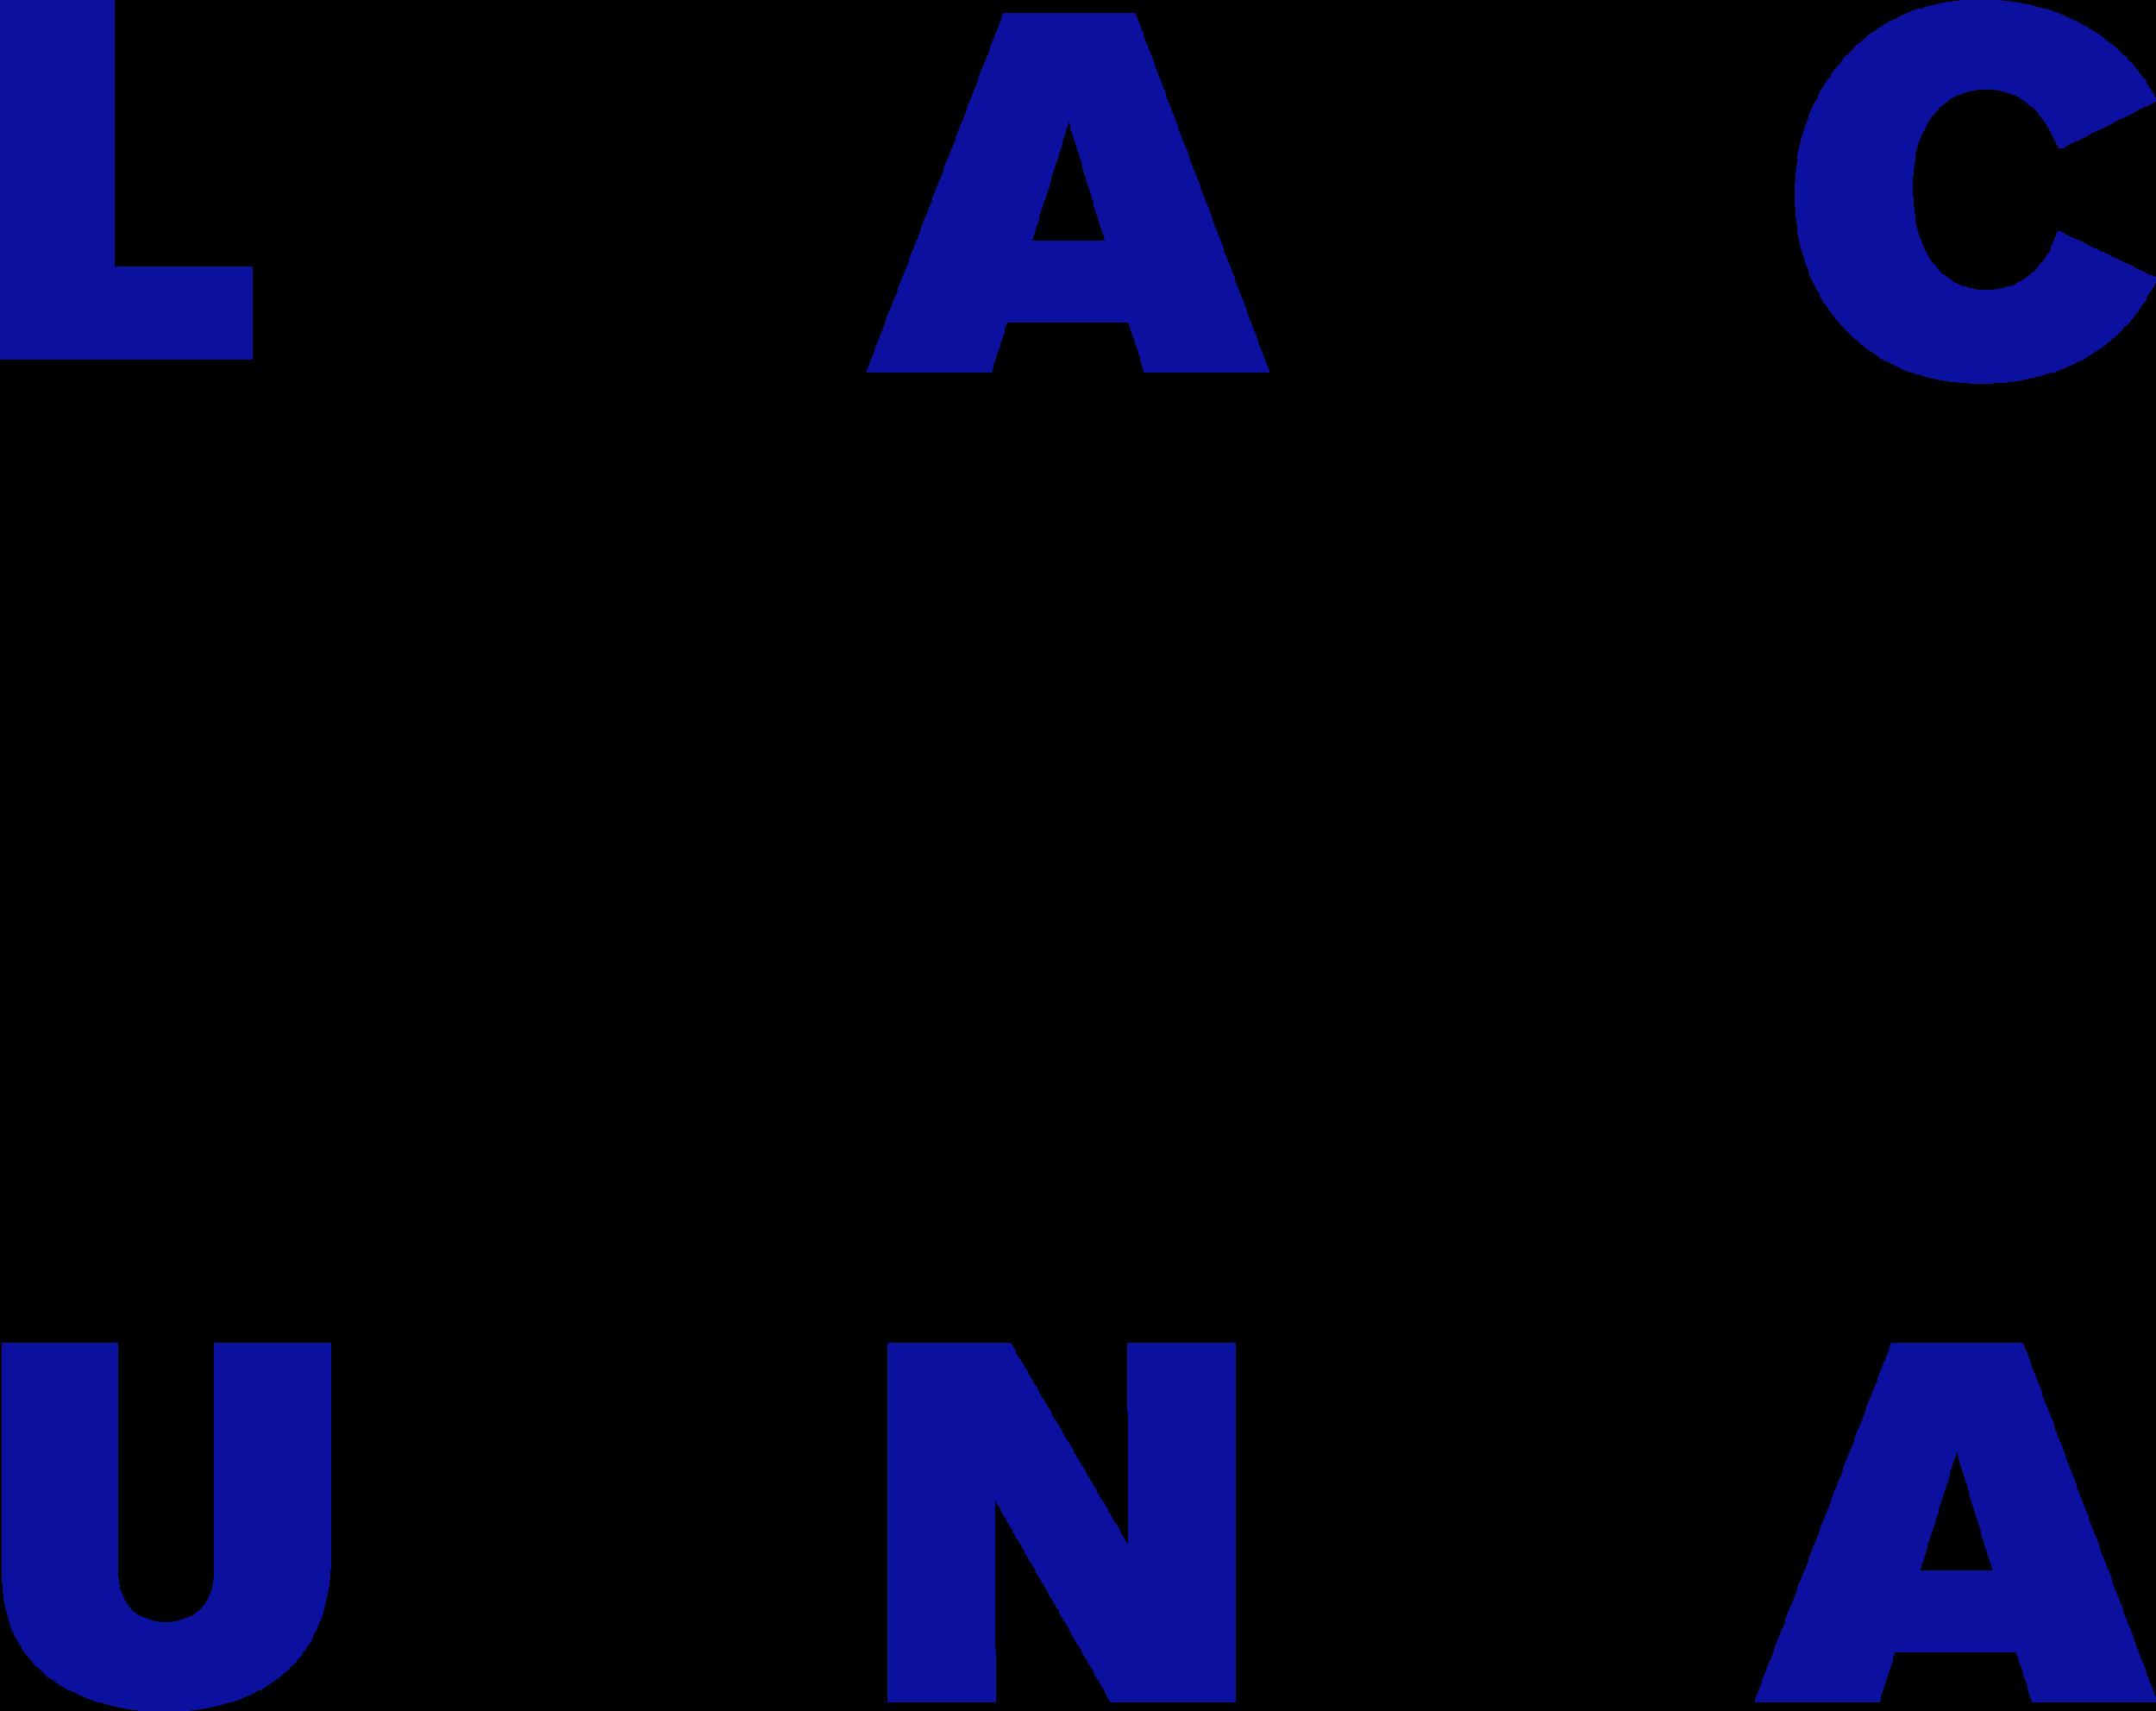 Lacuna Logo.png